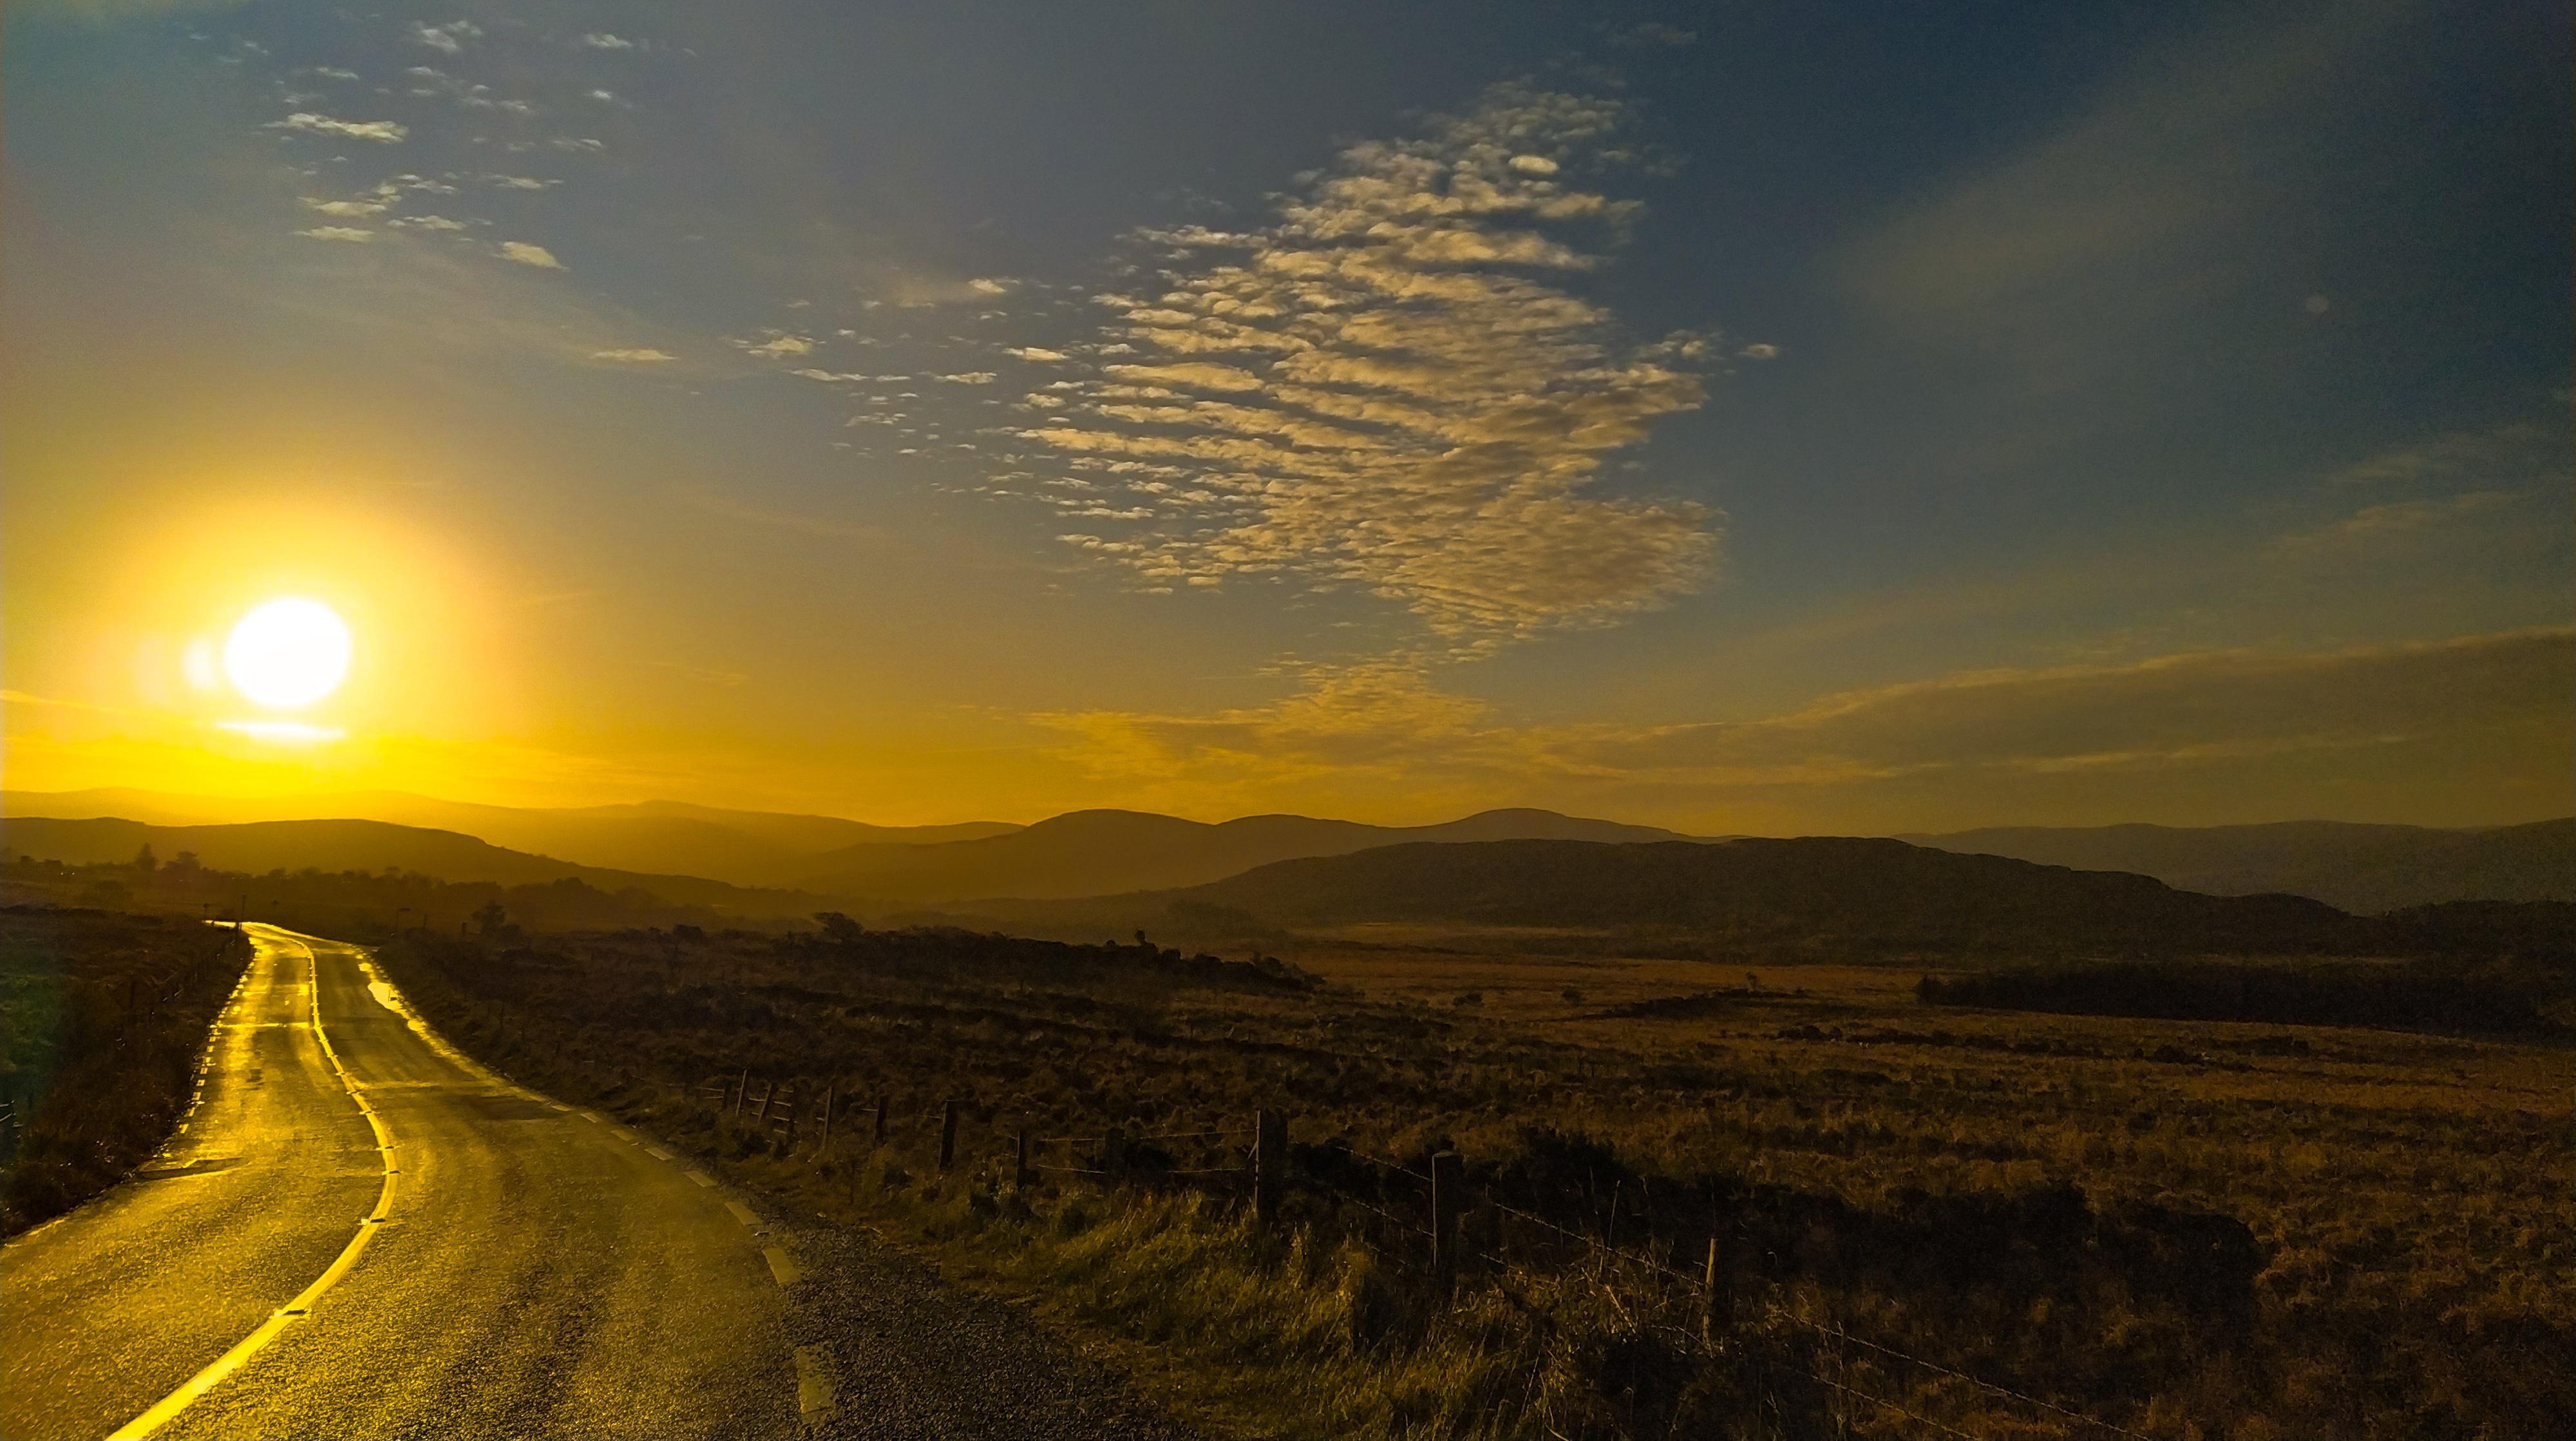 Kenmare Kerry Ireland 40002237 Oc In 2020 Beautiful Nature Landscape Photographers Nature